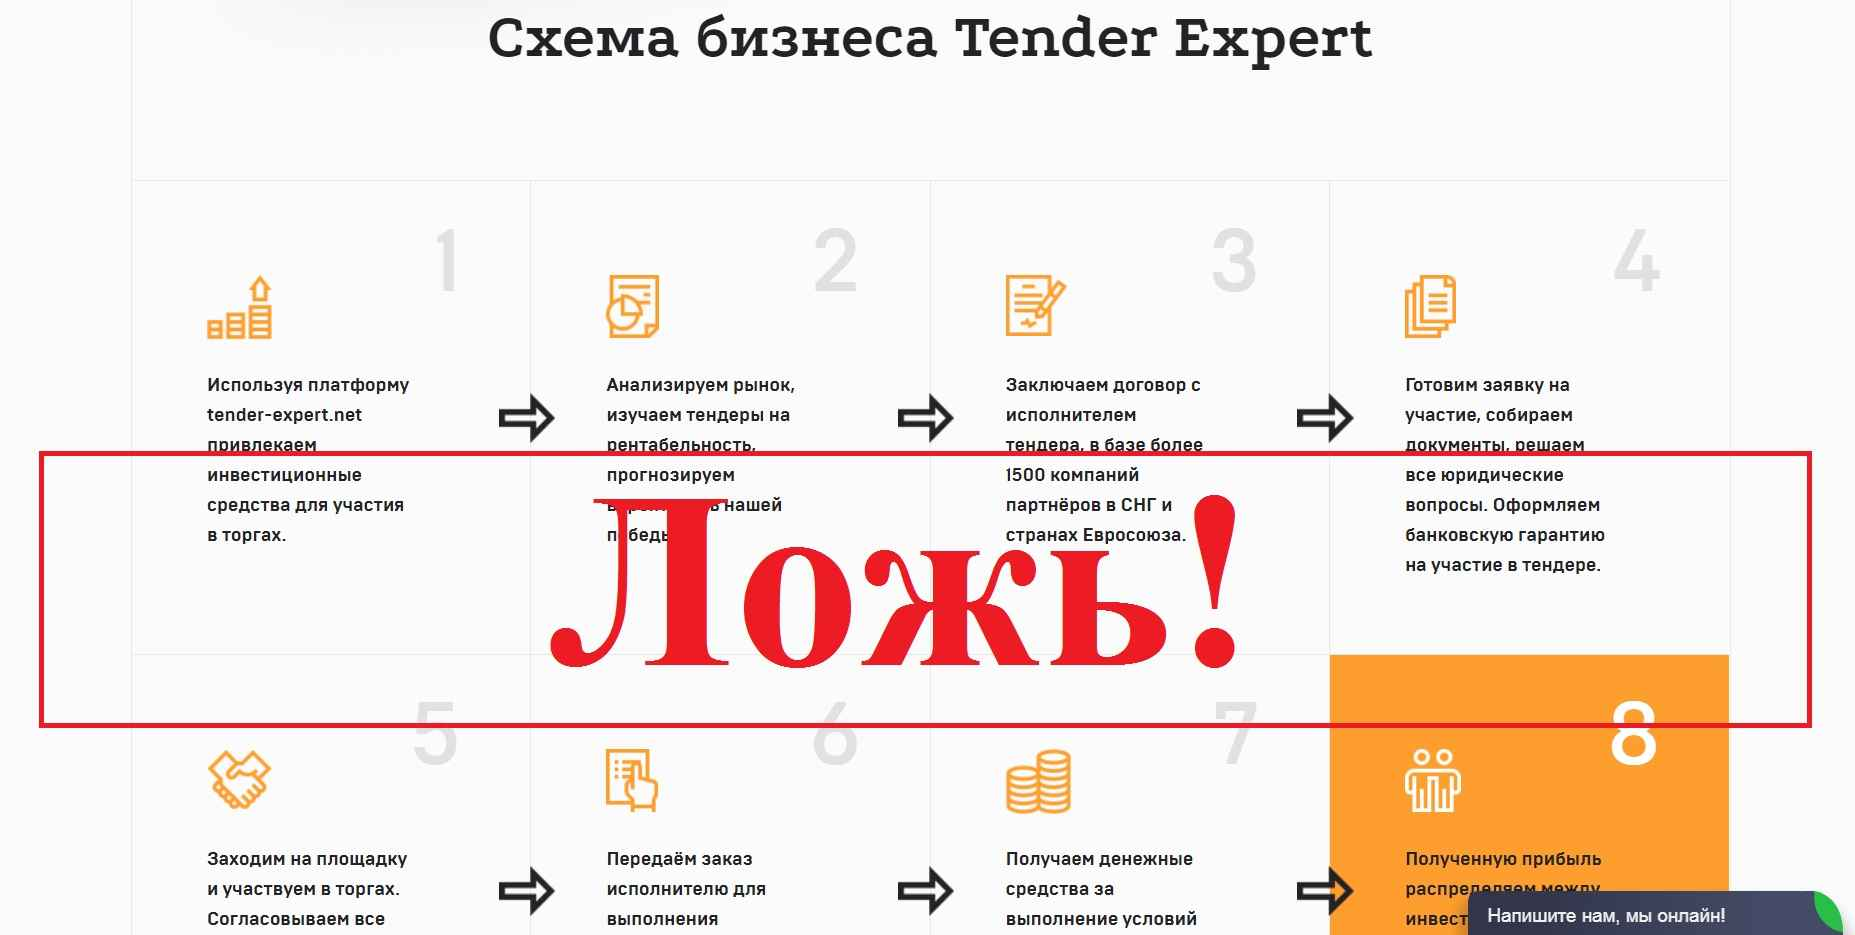 Tender Expert – отзывы об инвестиционном проекте tender-expert.net